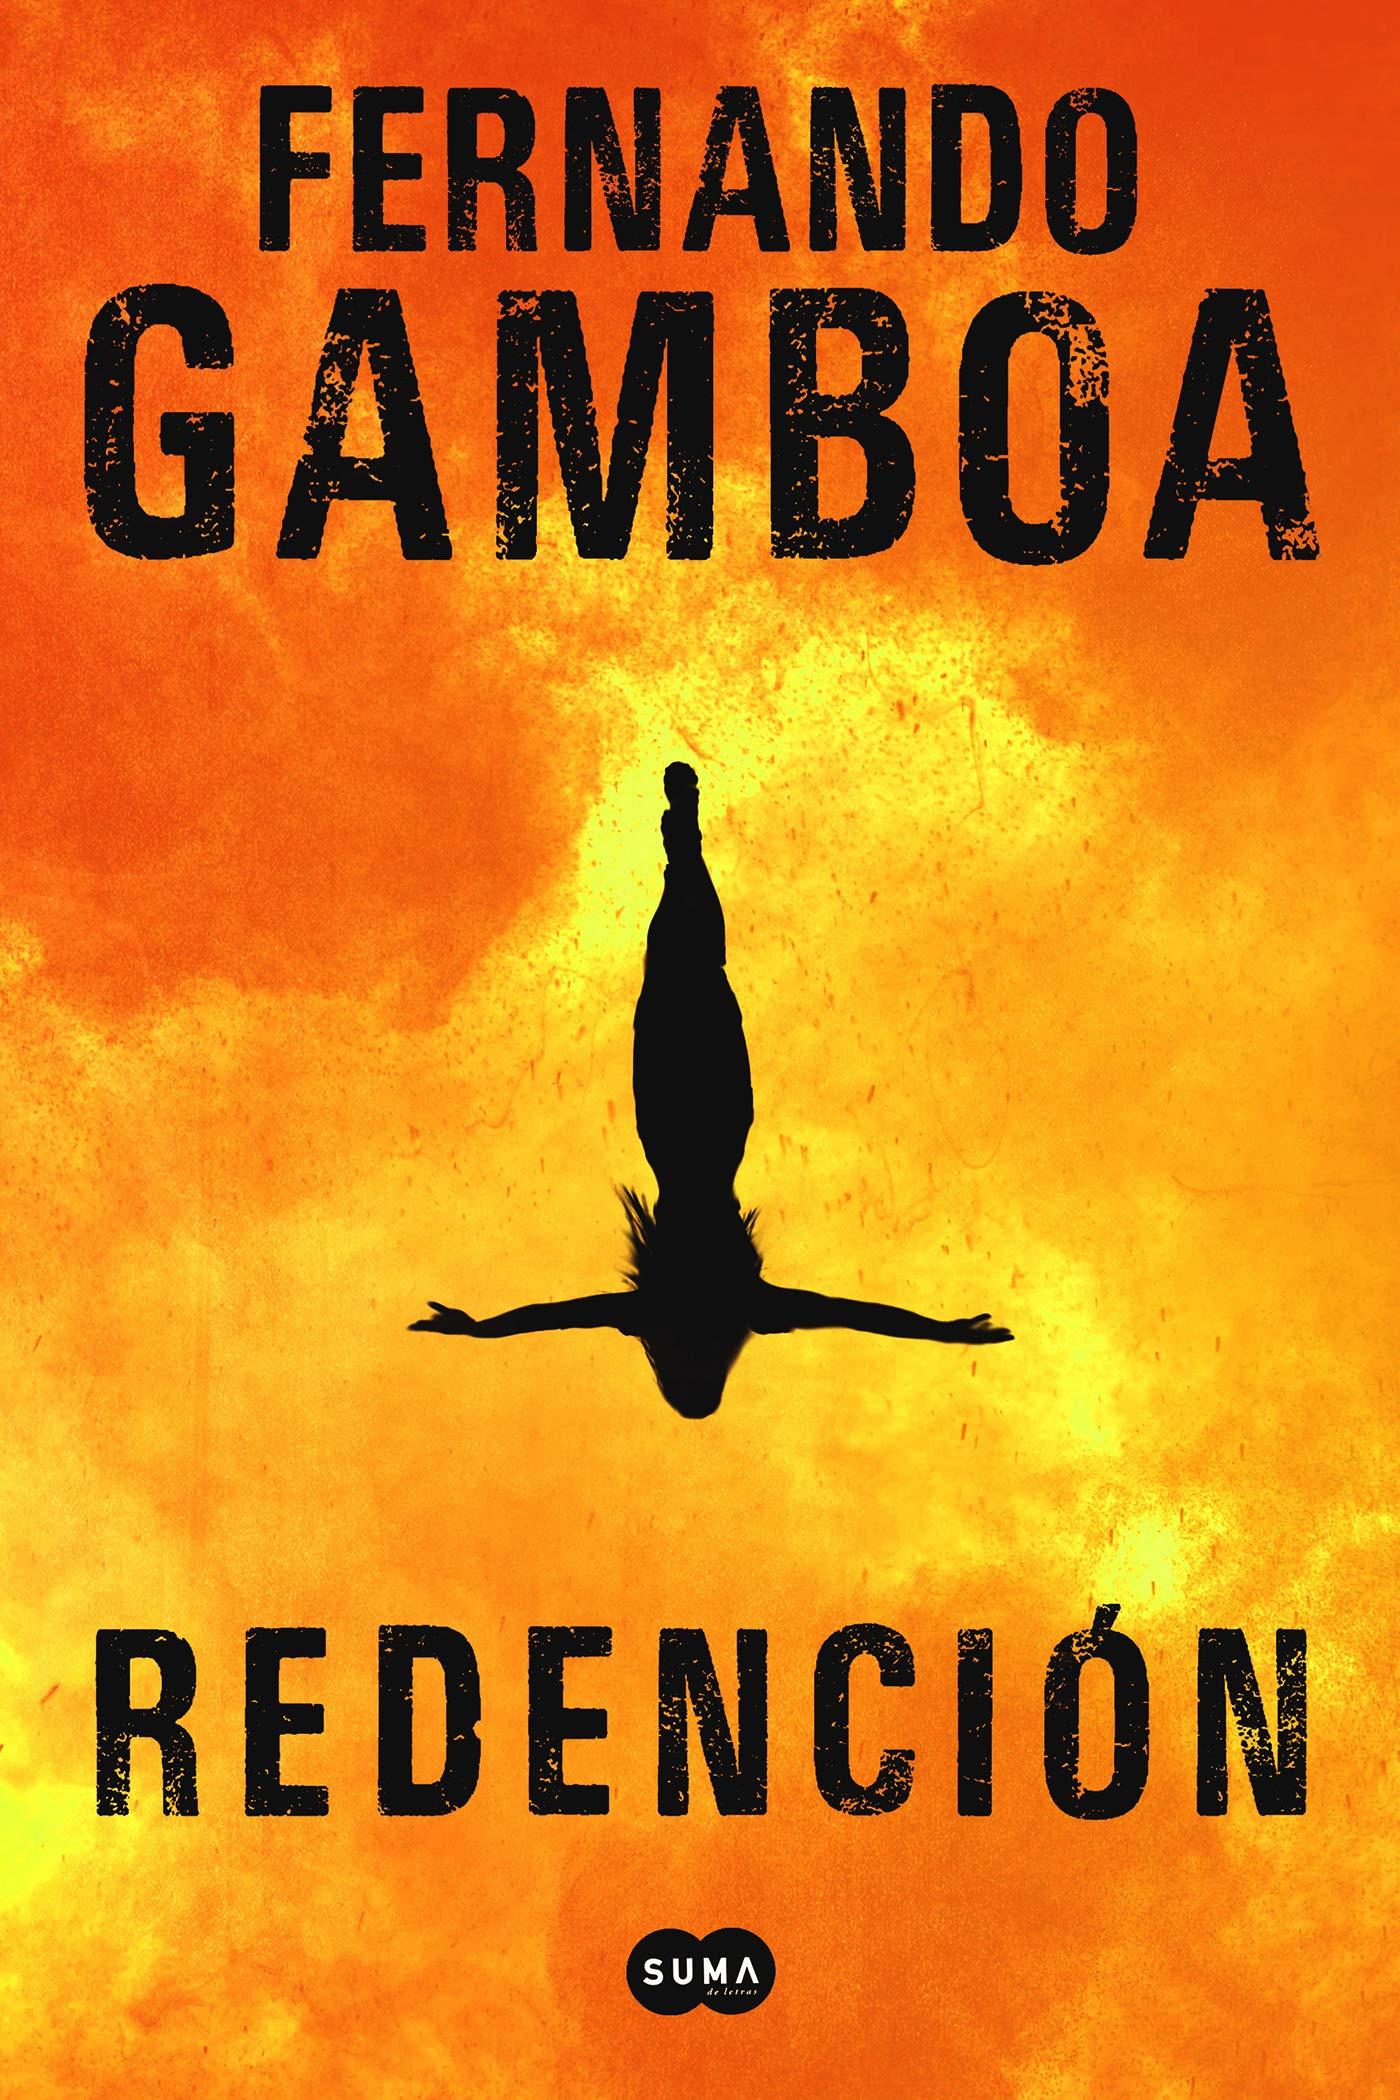 Redención (Tinta negra): Amazon.es: Fernando Gamboa: Libros